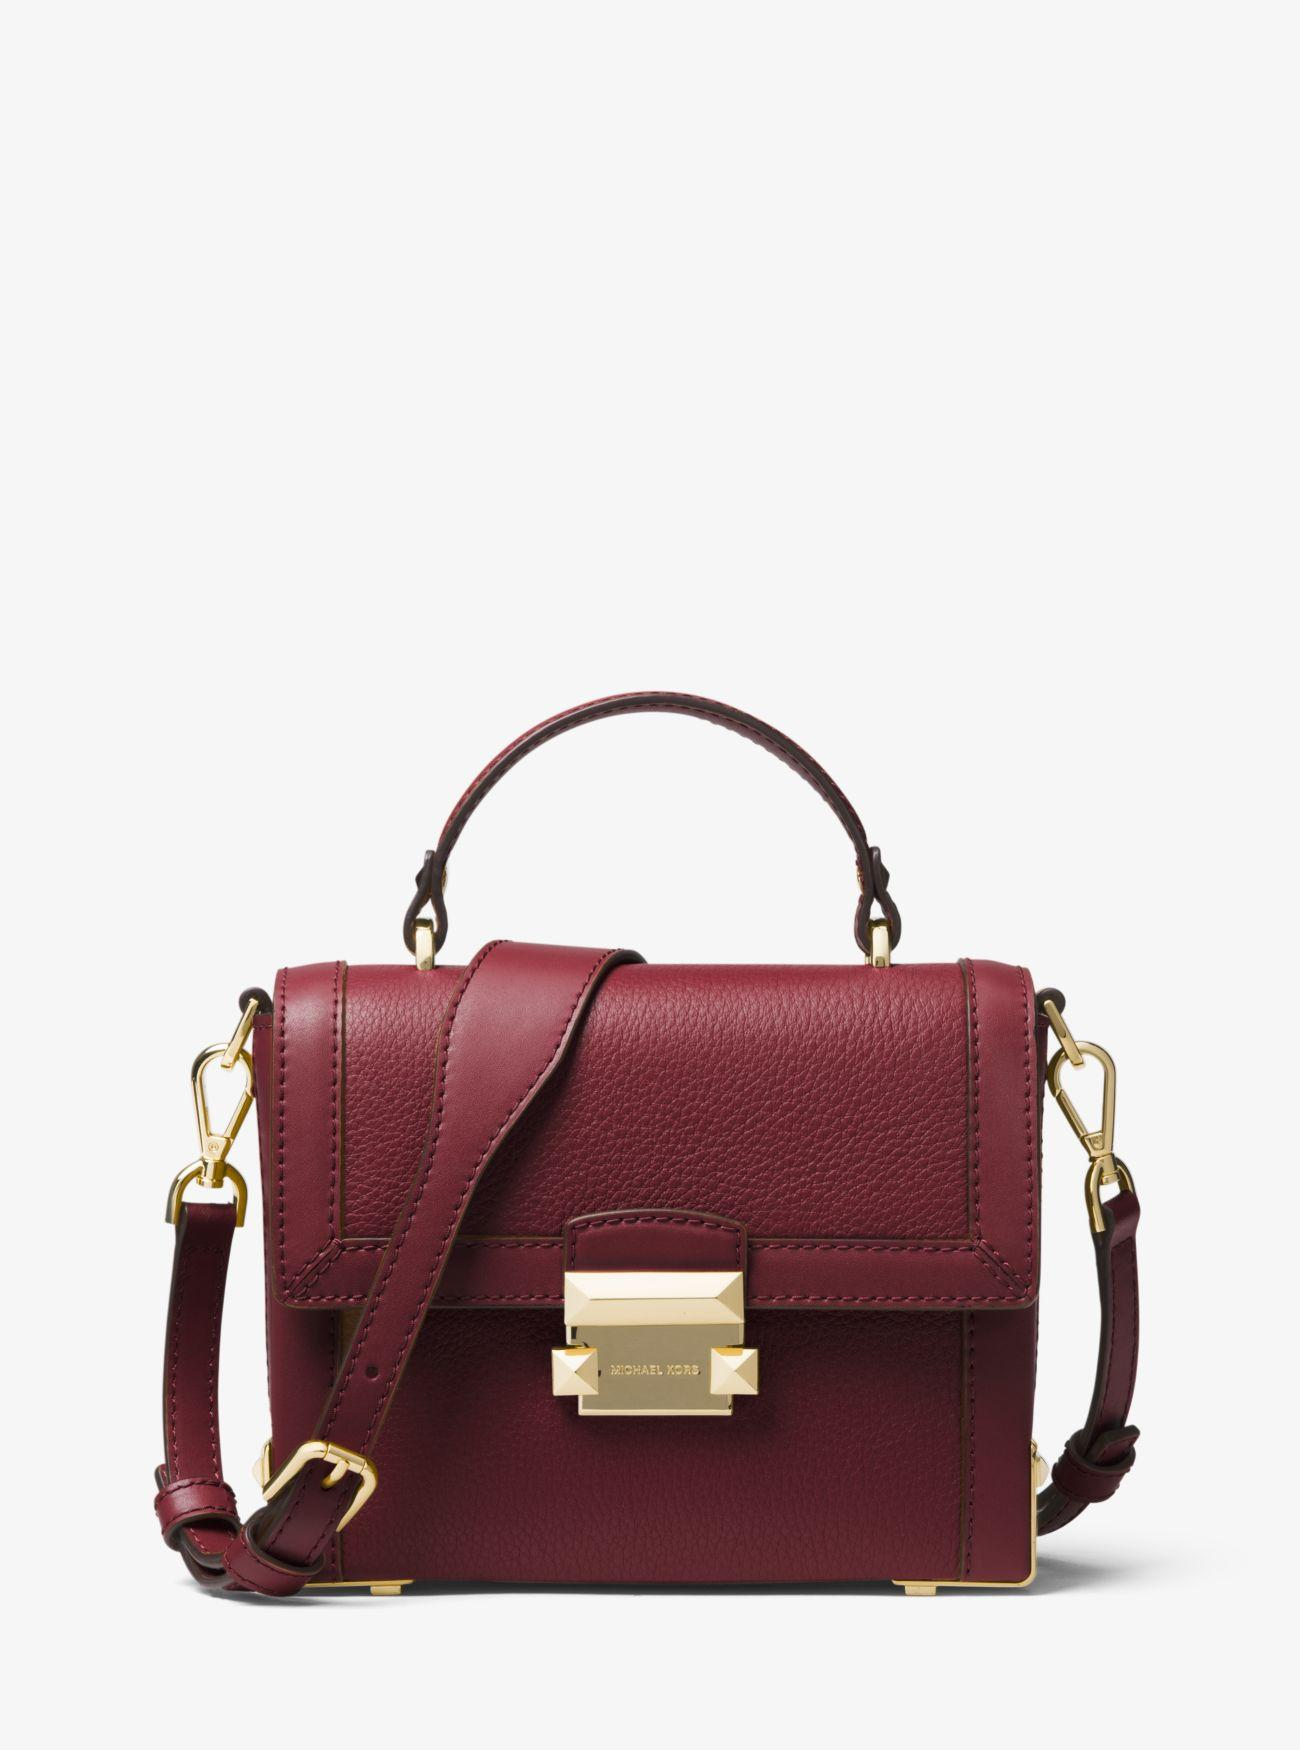 52a59ddf2588 Michael Kors - Multicolor Jayne Small Pebbled Leather Trunk Bag - Lyst.  View fullscreen